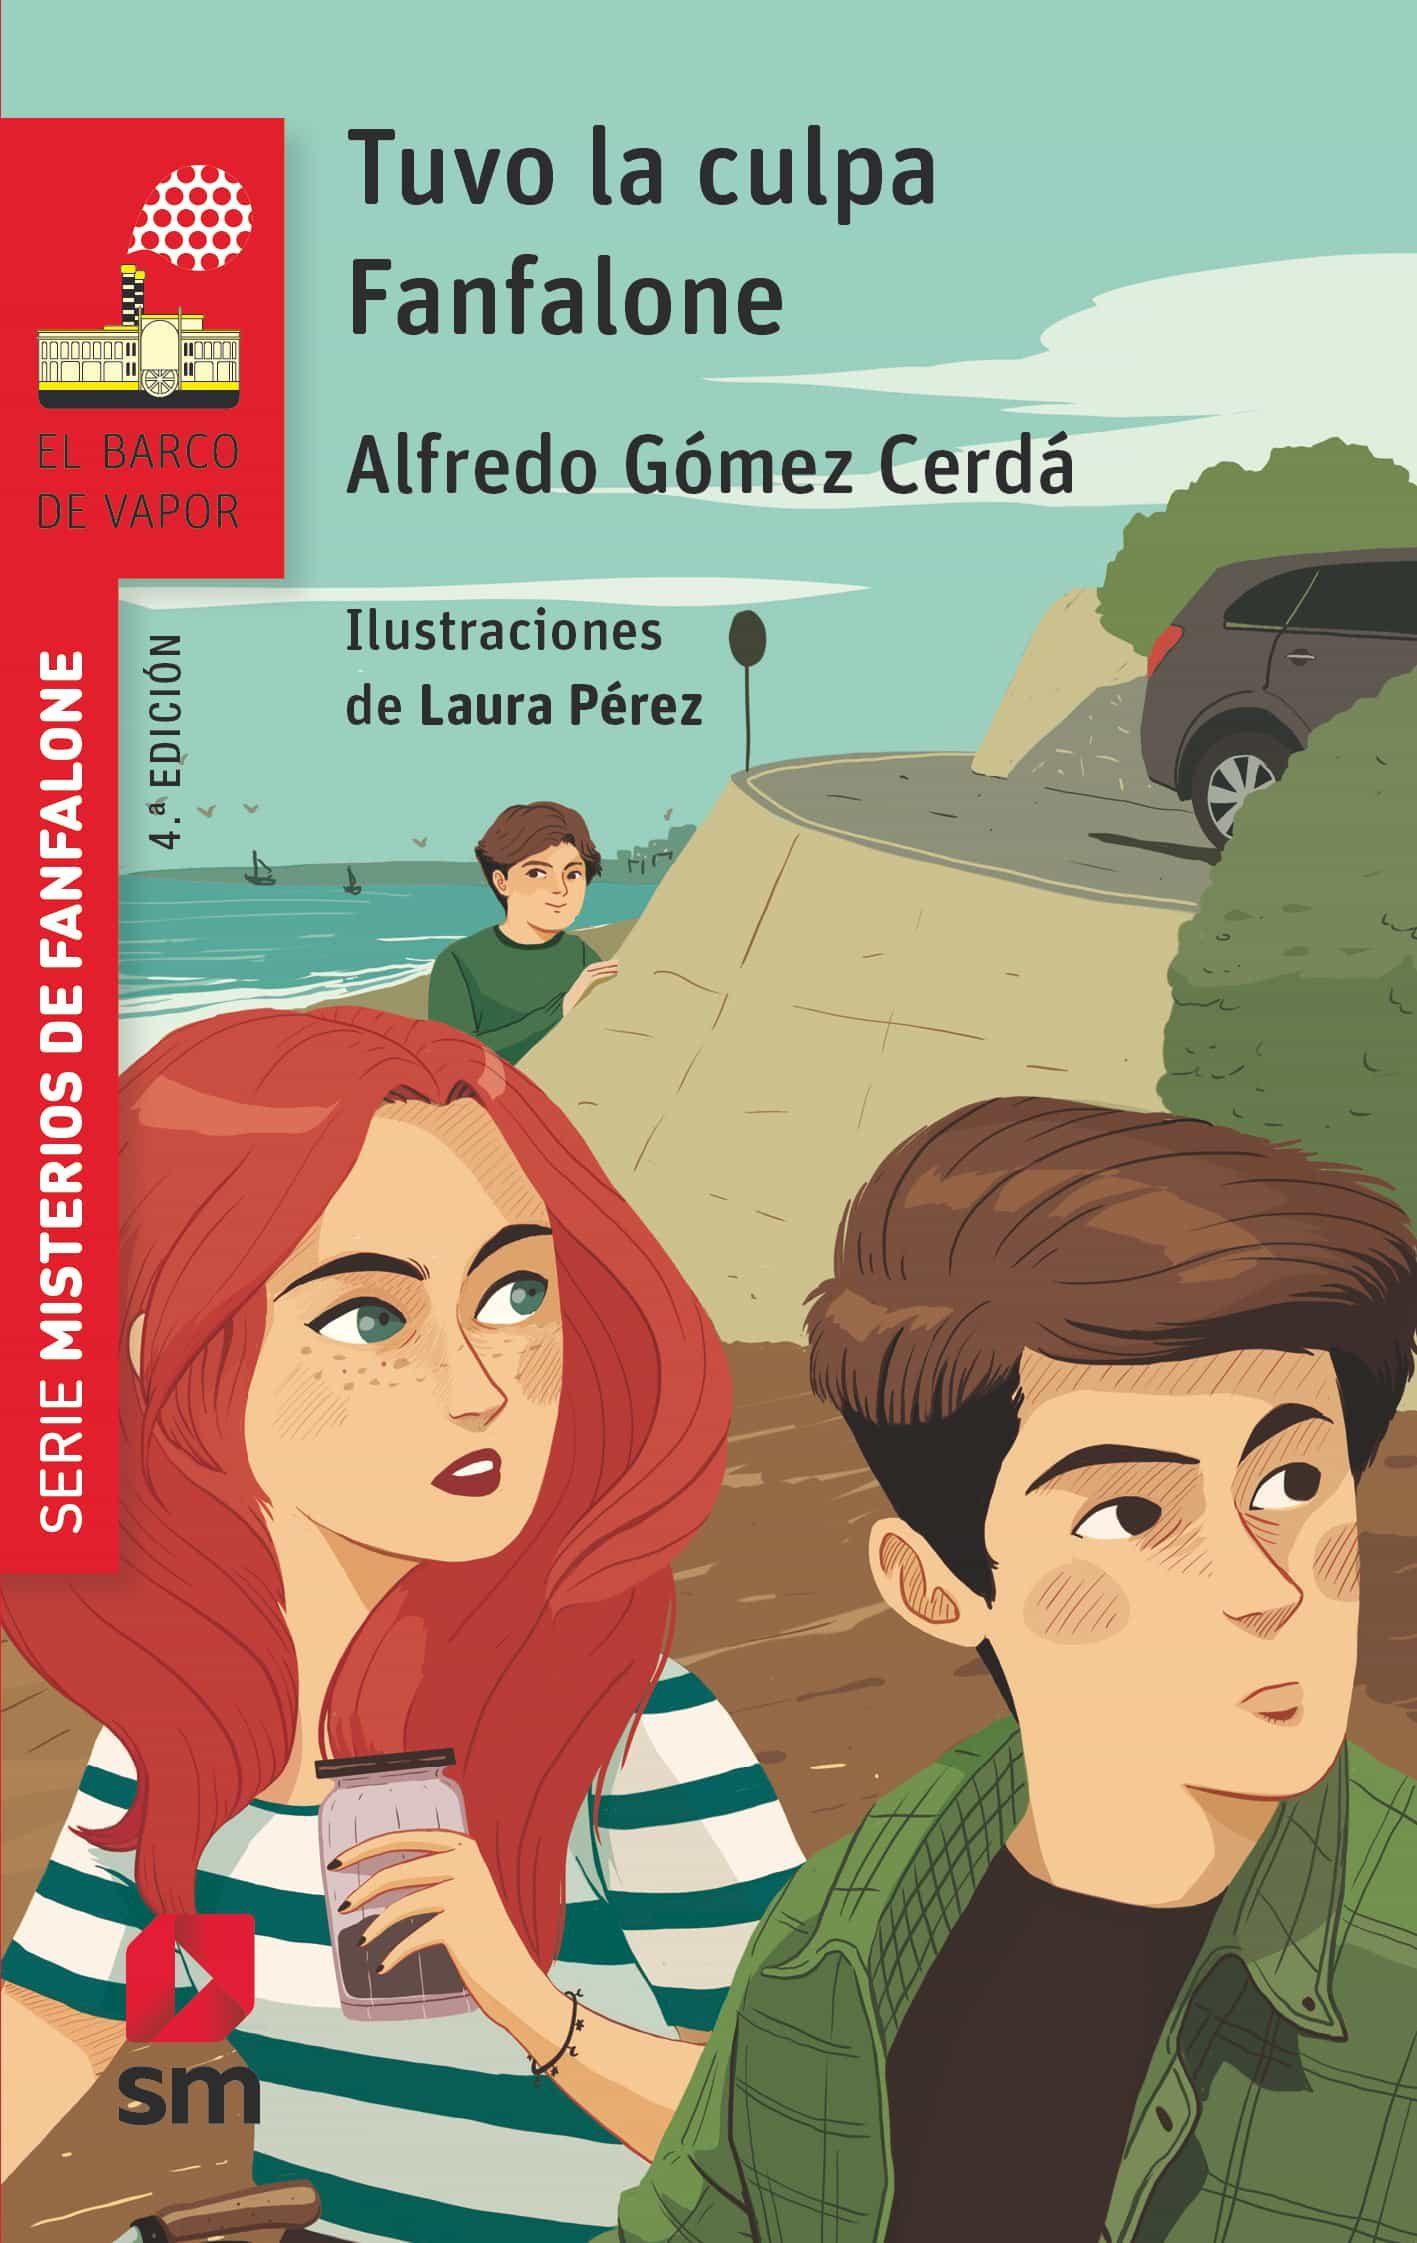 Tuvo La Culpa Fanfalone por Alfredo Gomez Cerda